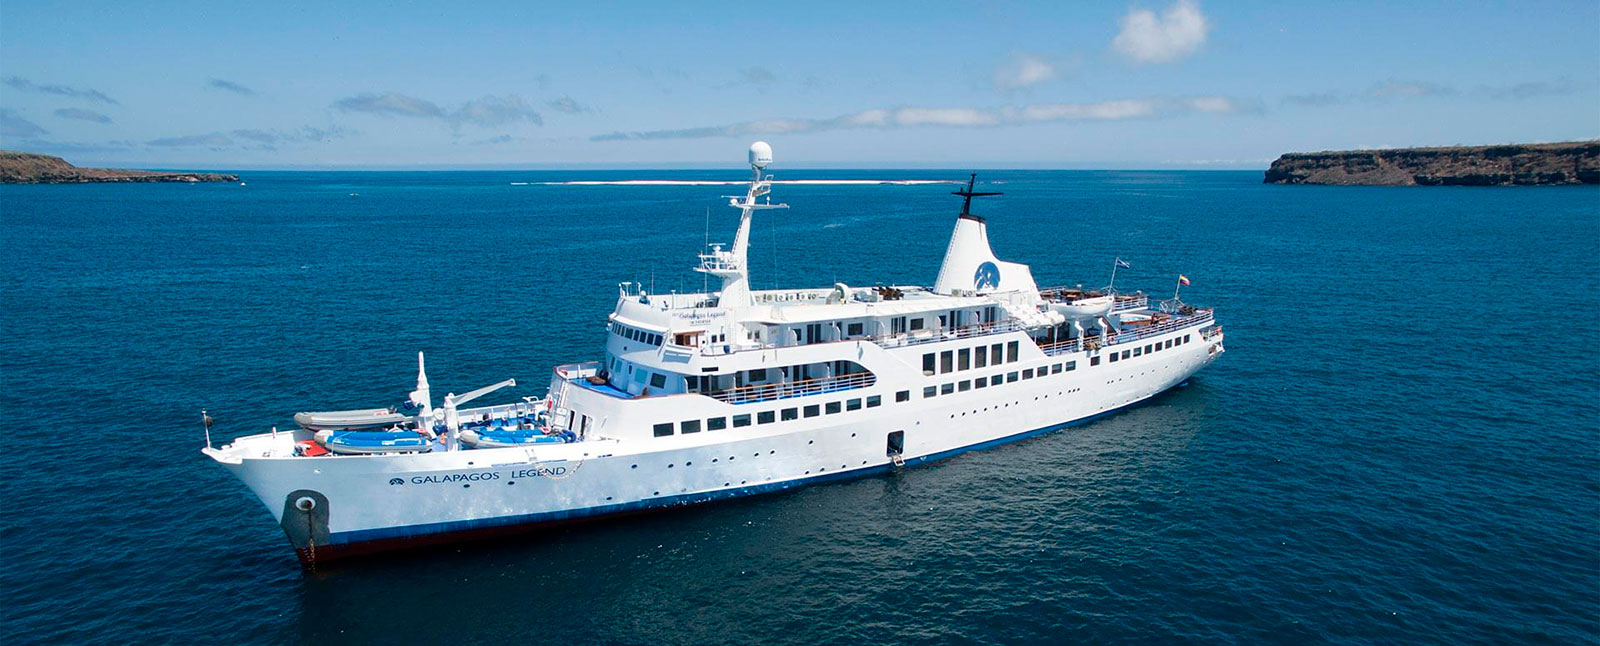 Legend cruise